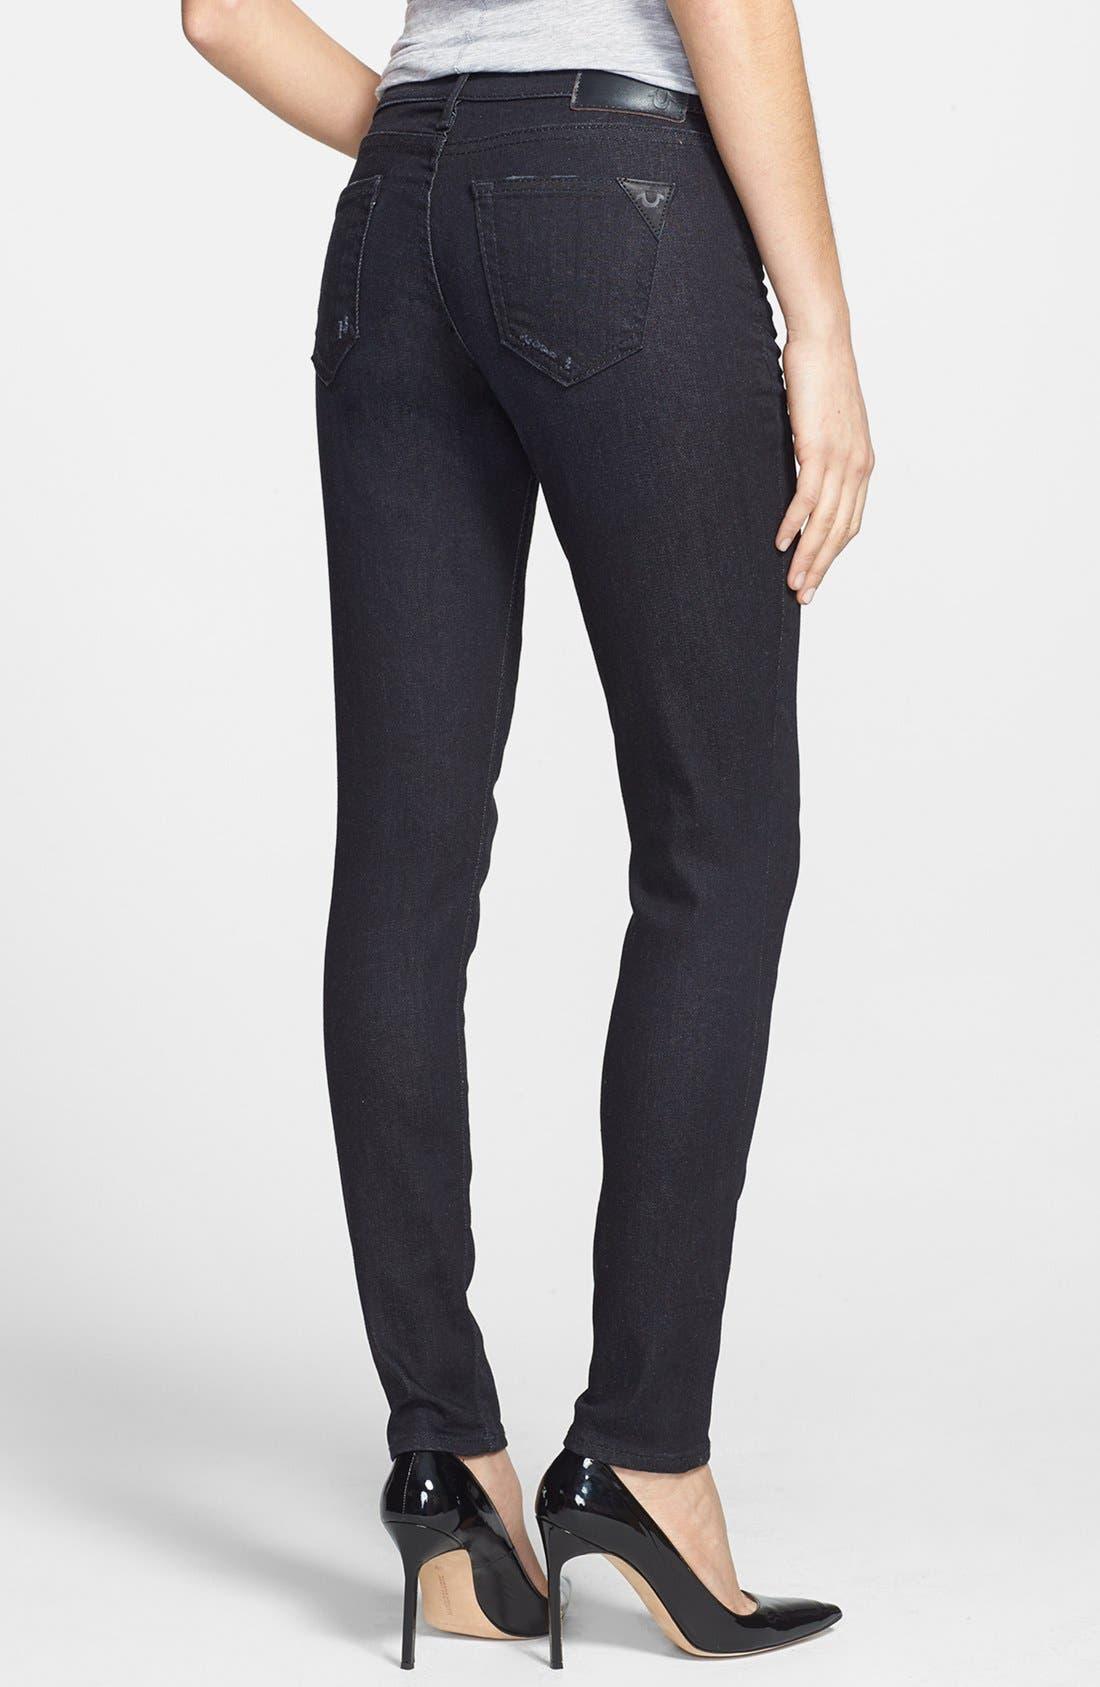 Alternate Image 2  - True Religion Brand Jeans 'Casey' Skinny Jeans (Black Smoke Vintage)